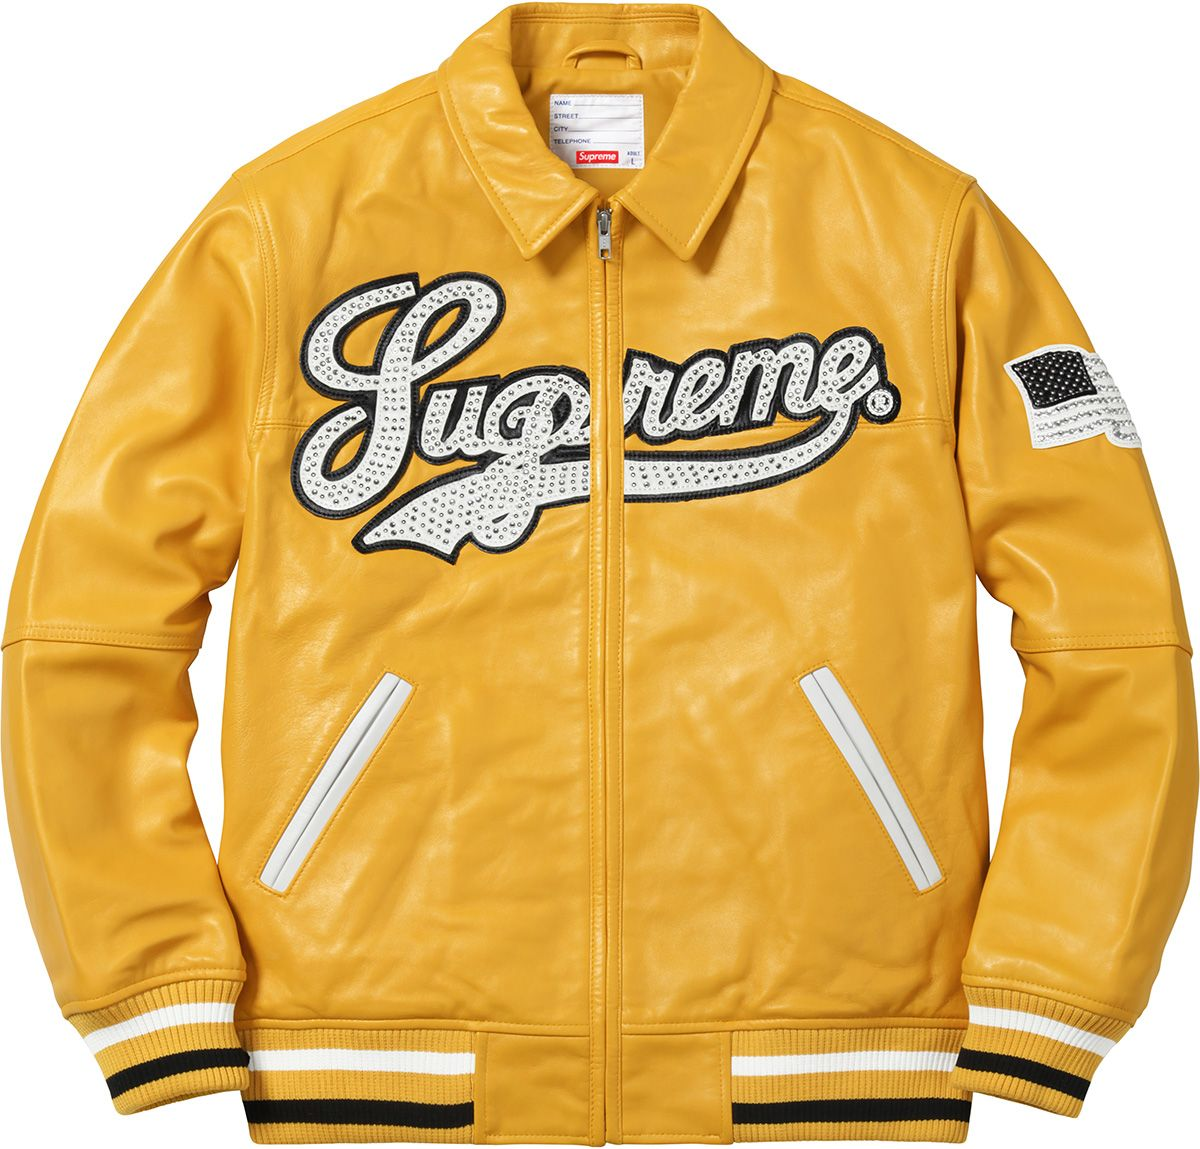 Supreme Uptown Studded Leather Varsity Jacket Leren jas